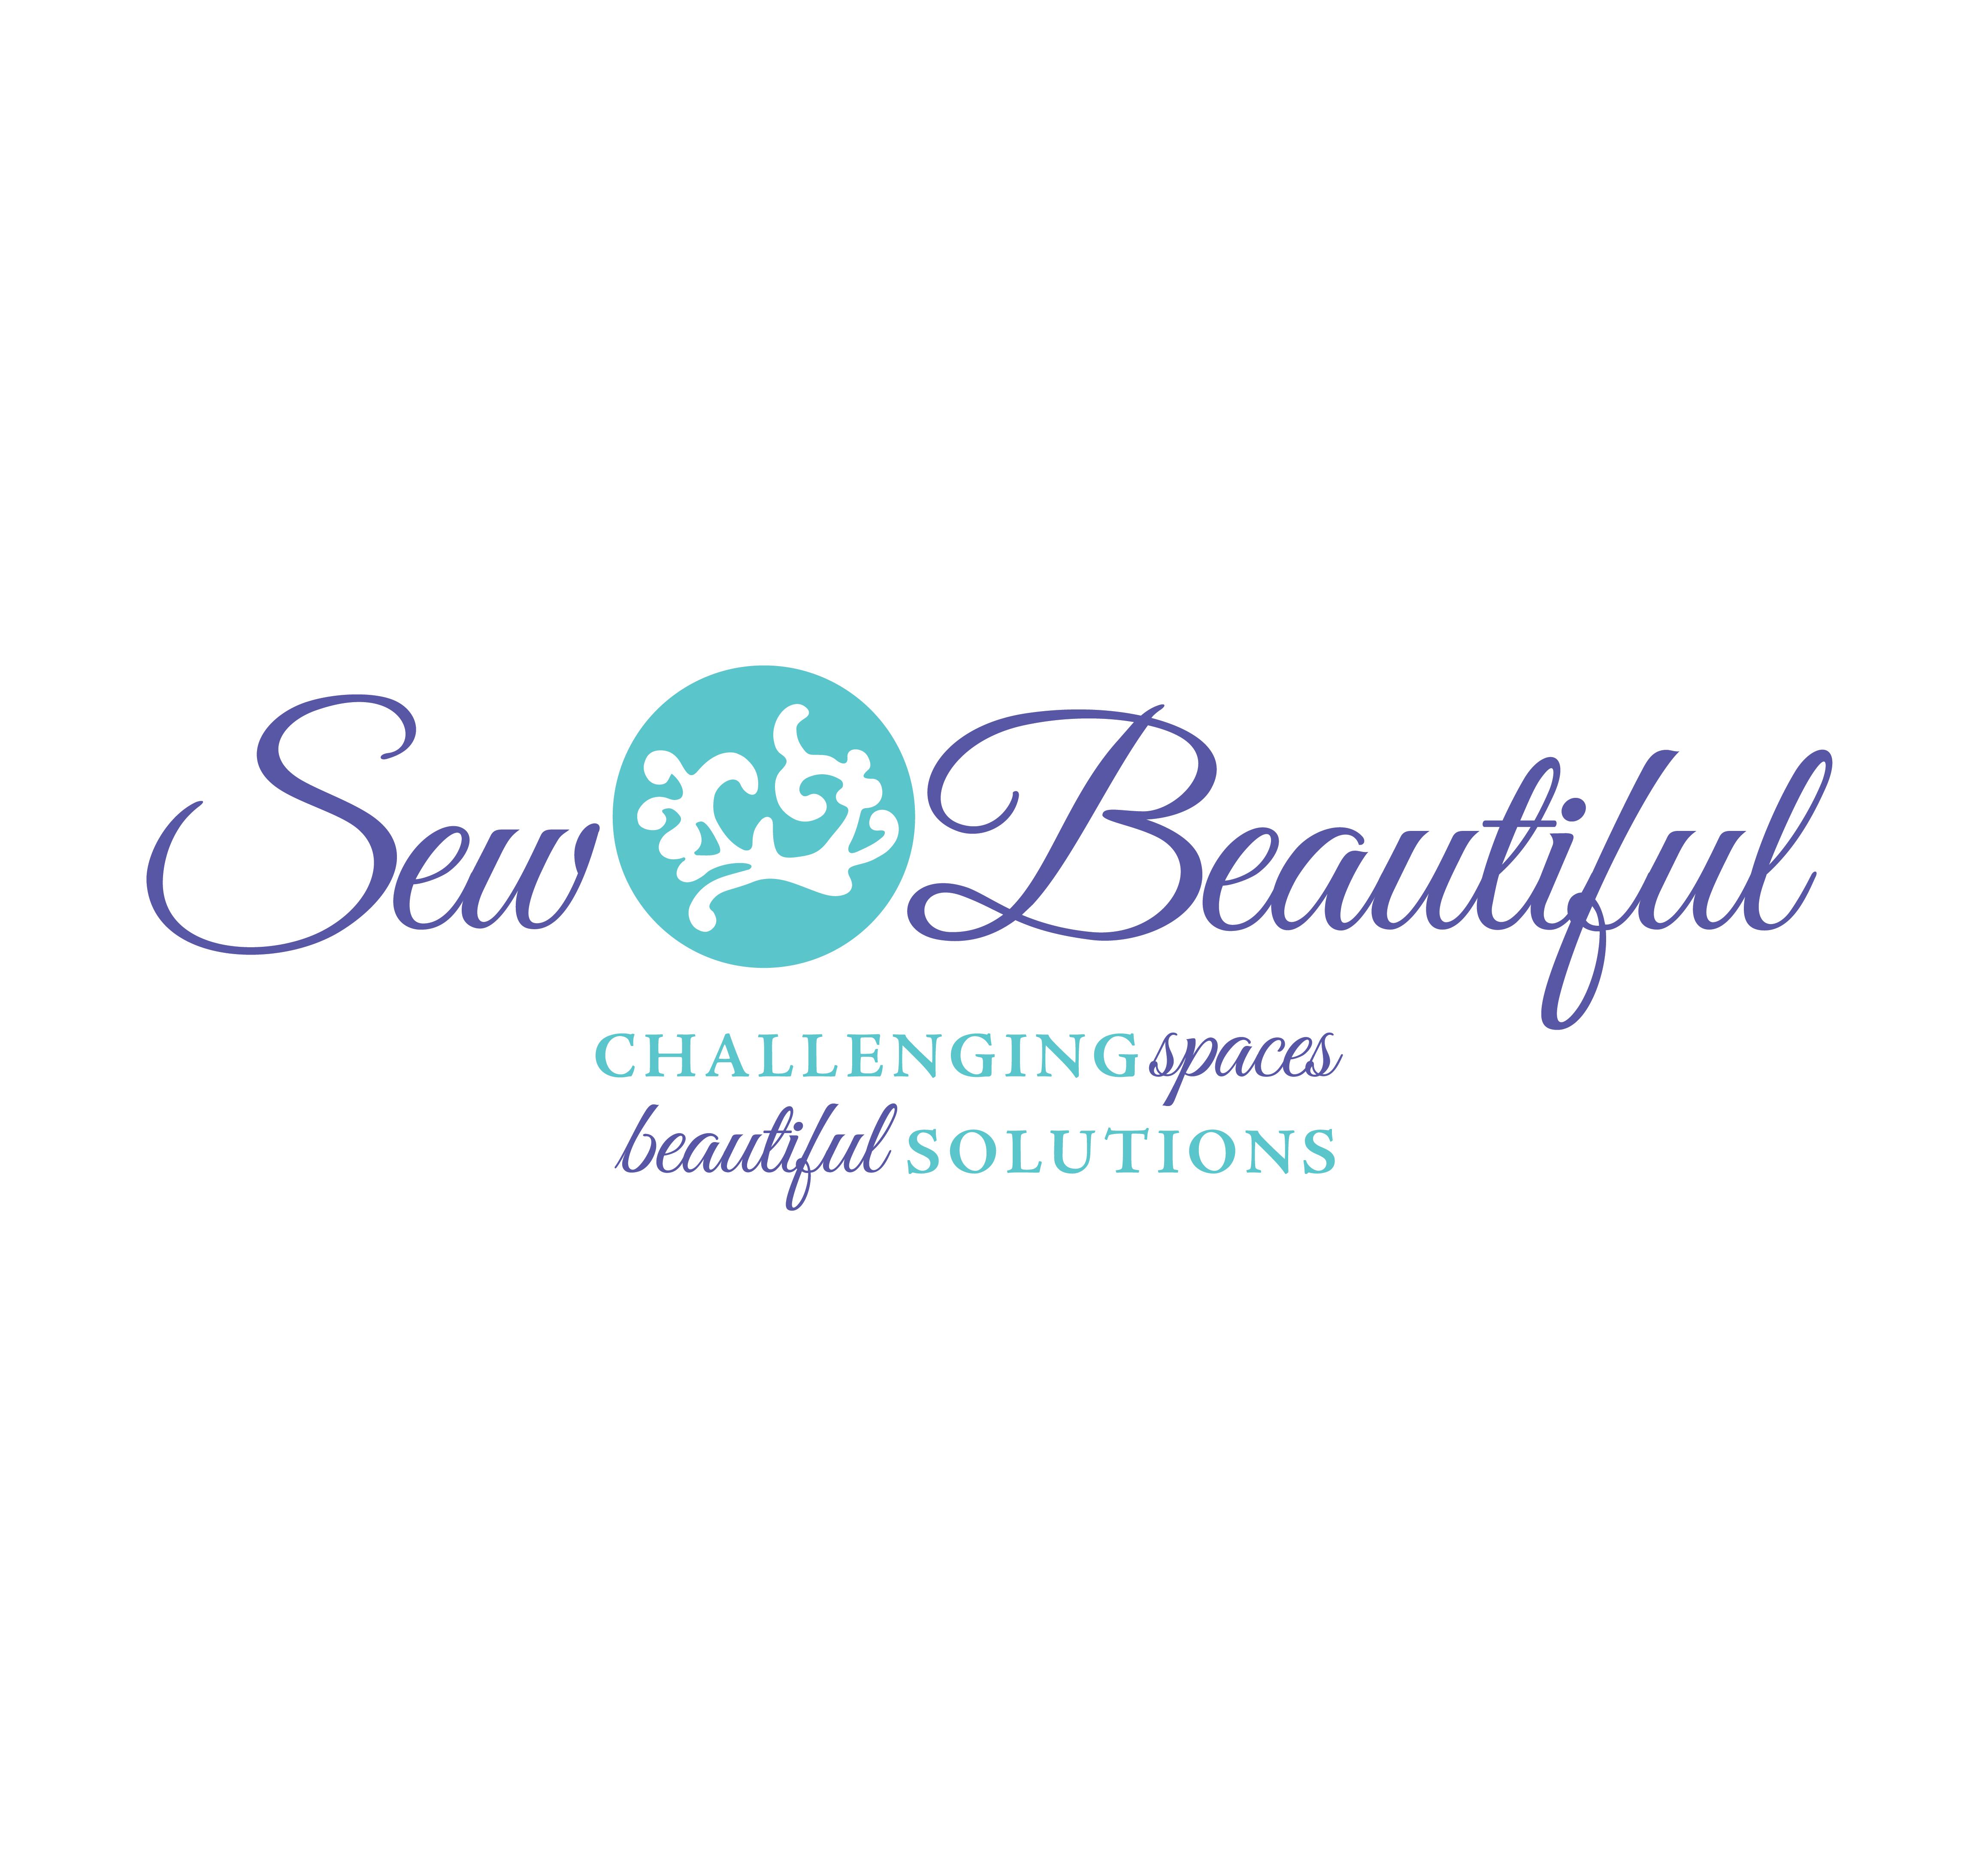 Sew Beautiful Logo